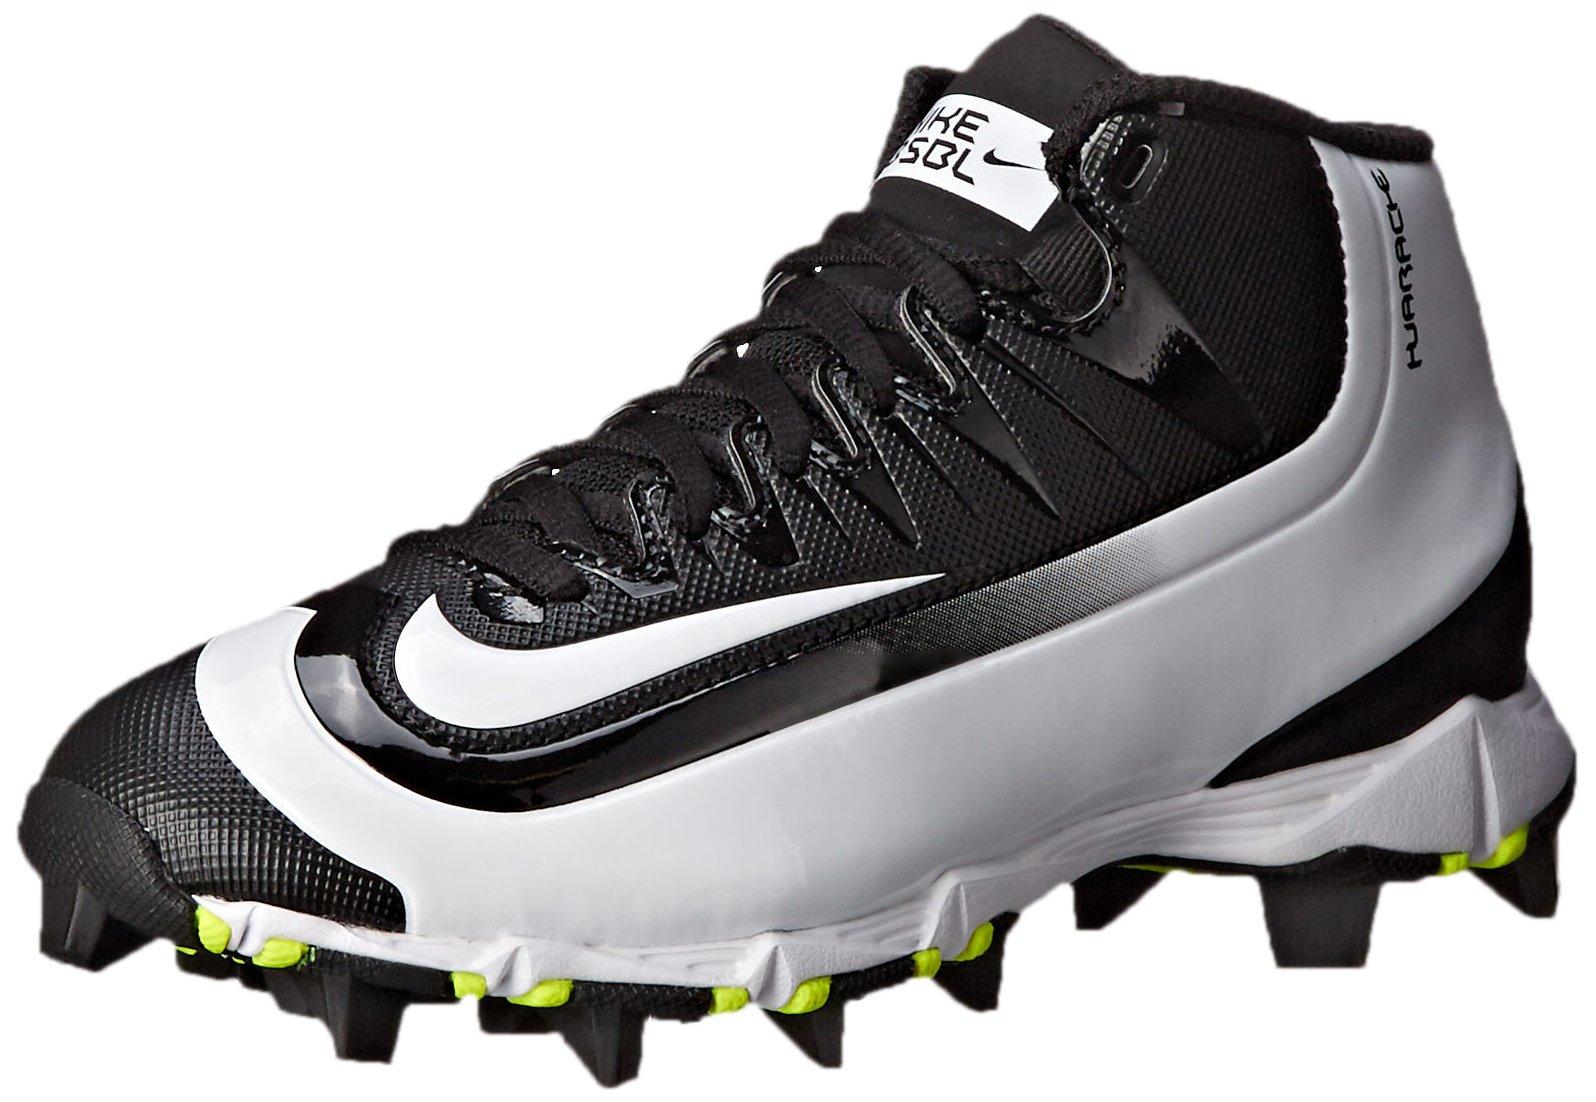 Nike Boy's Huarache 2KFilth Keystone (GS) Baseball Cleat Black/Volt/White Size 1.5 M US